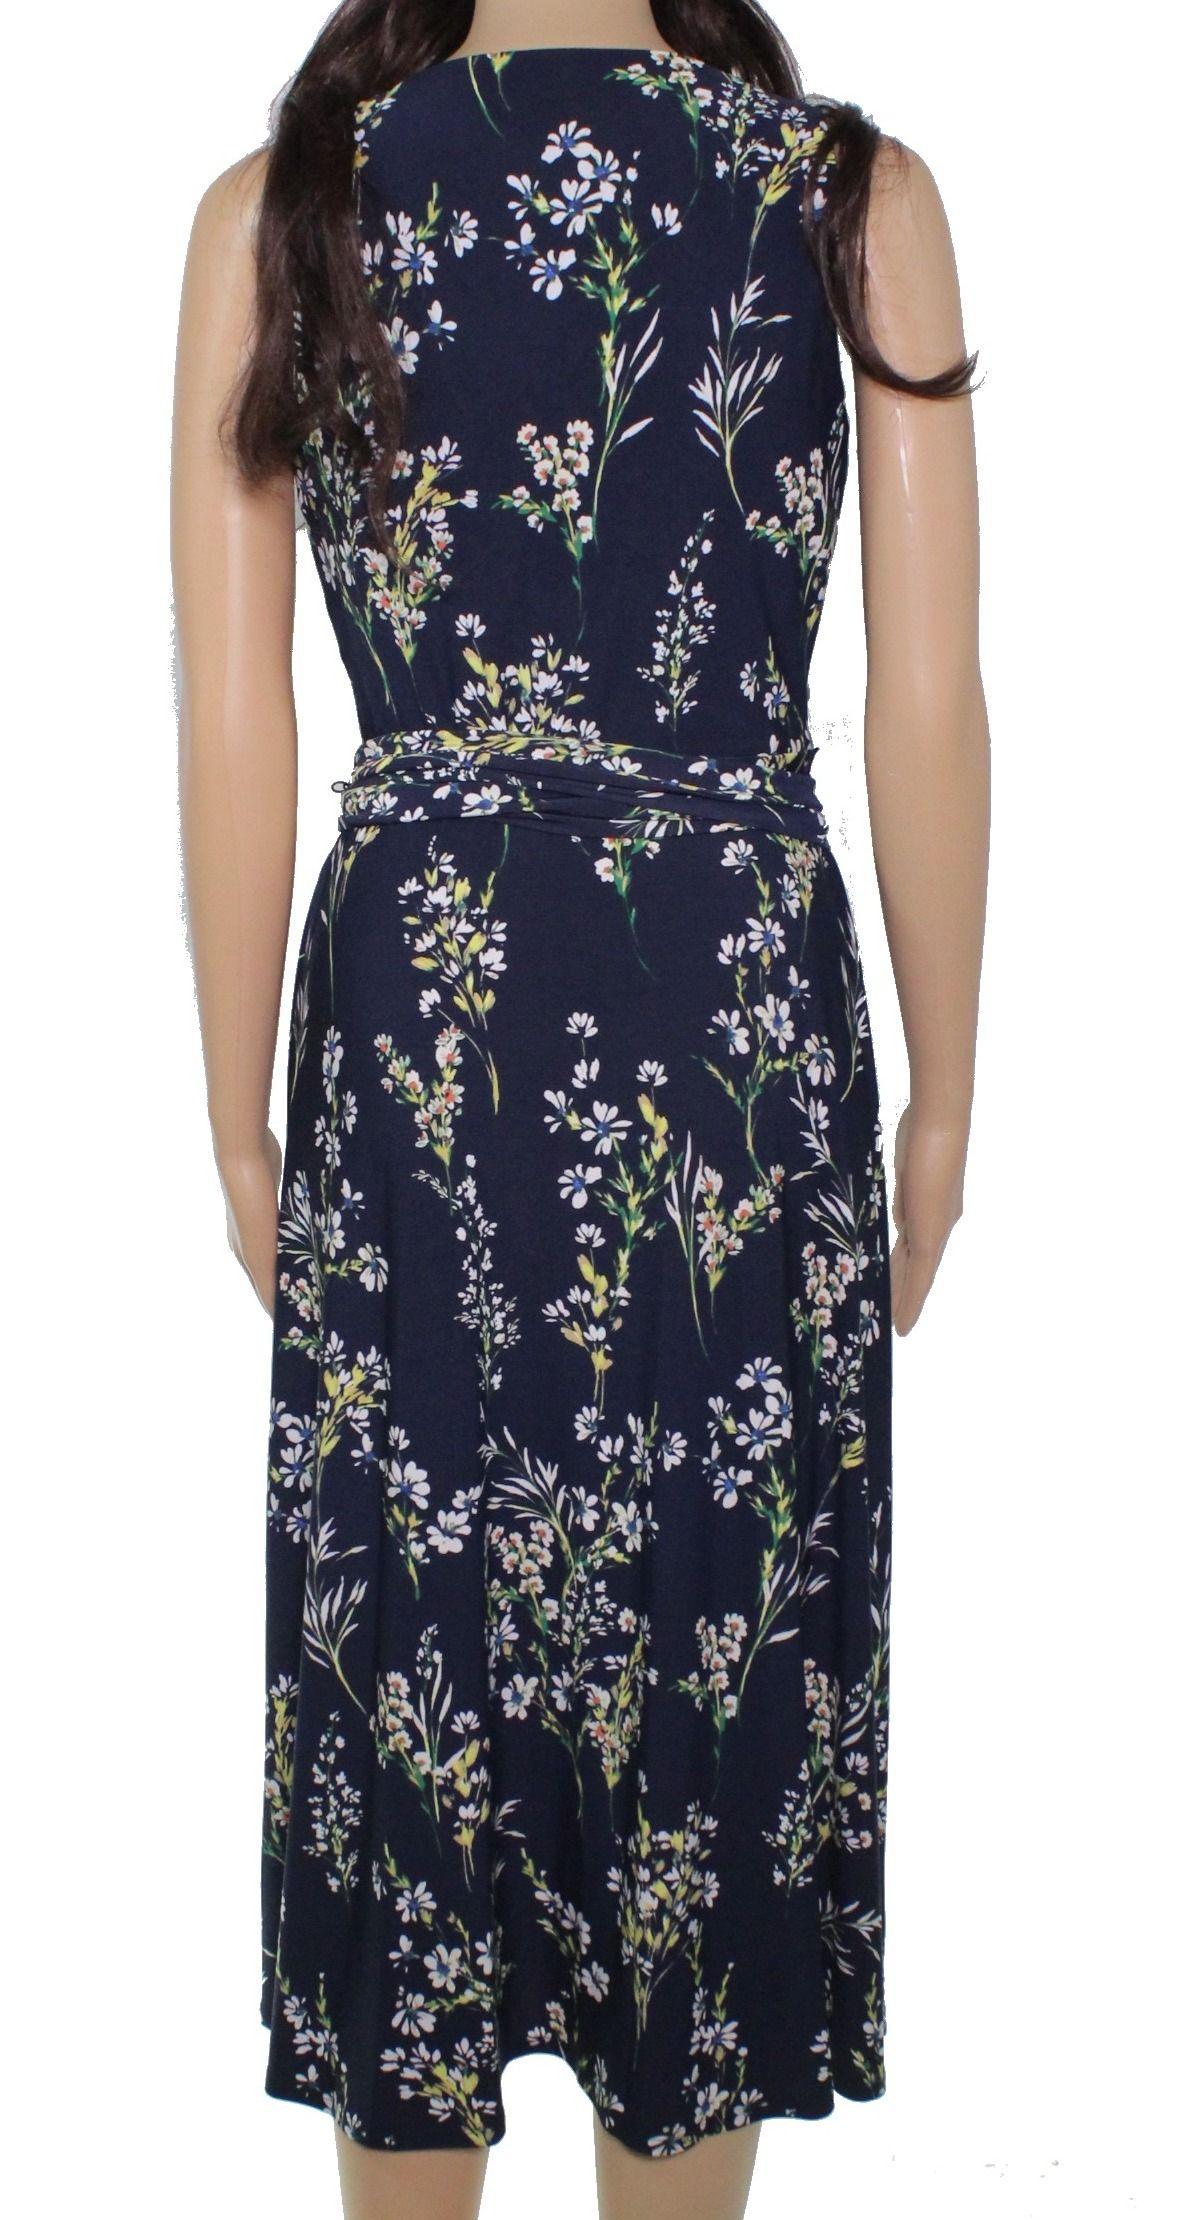 Lauren By Ralph Lauren Women's A-Line Dress Blue Size 8 Floral V-Neck